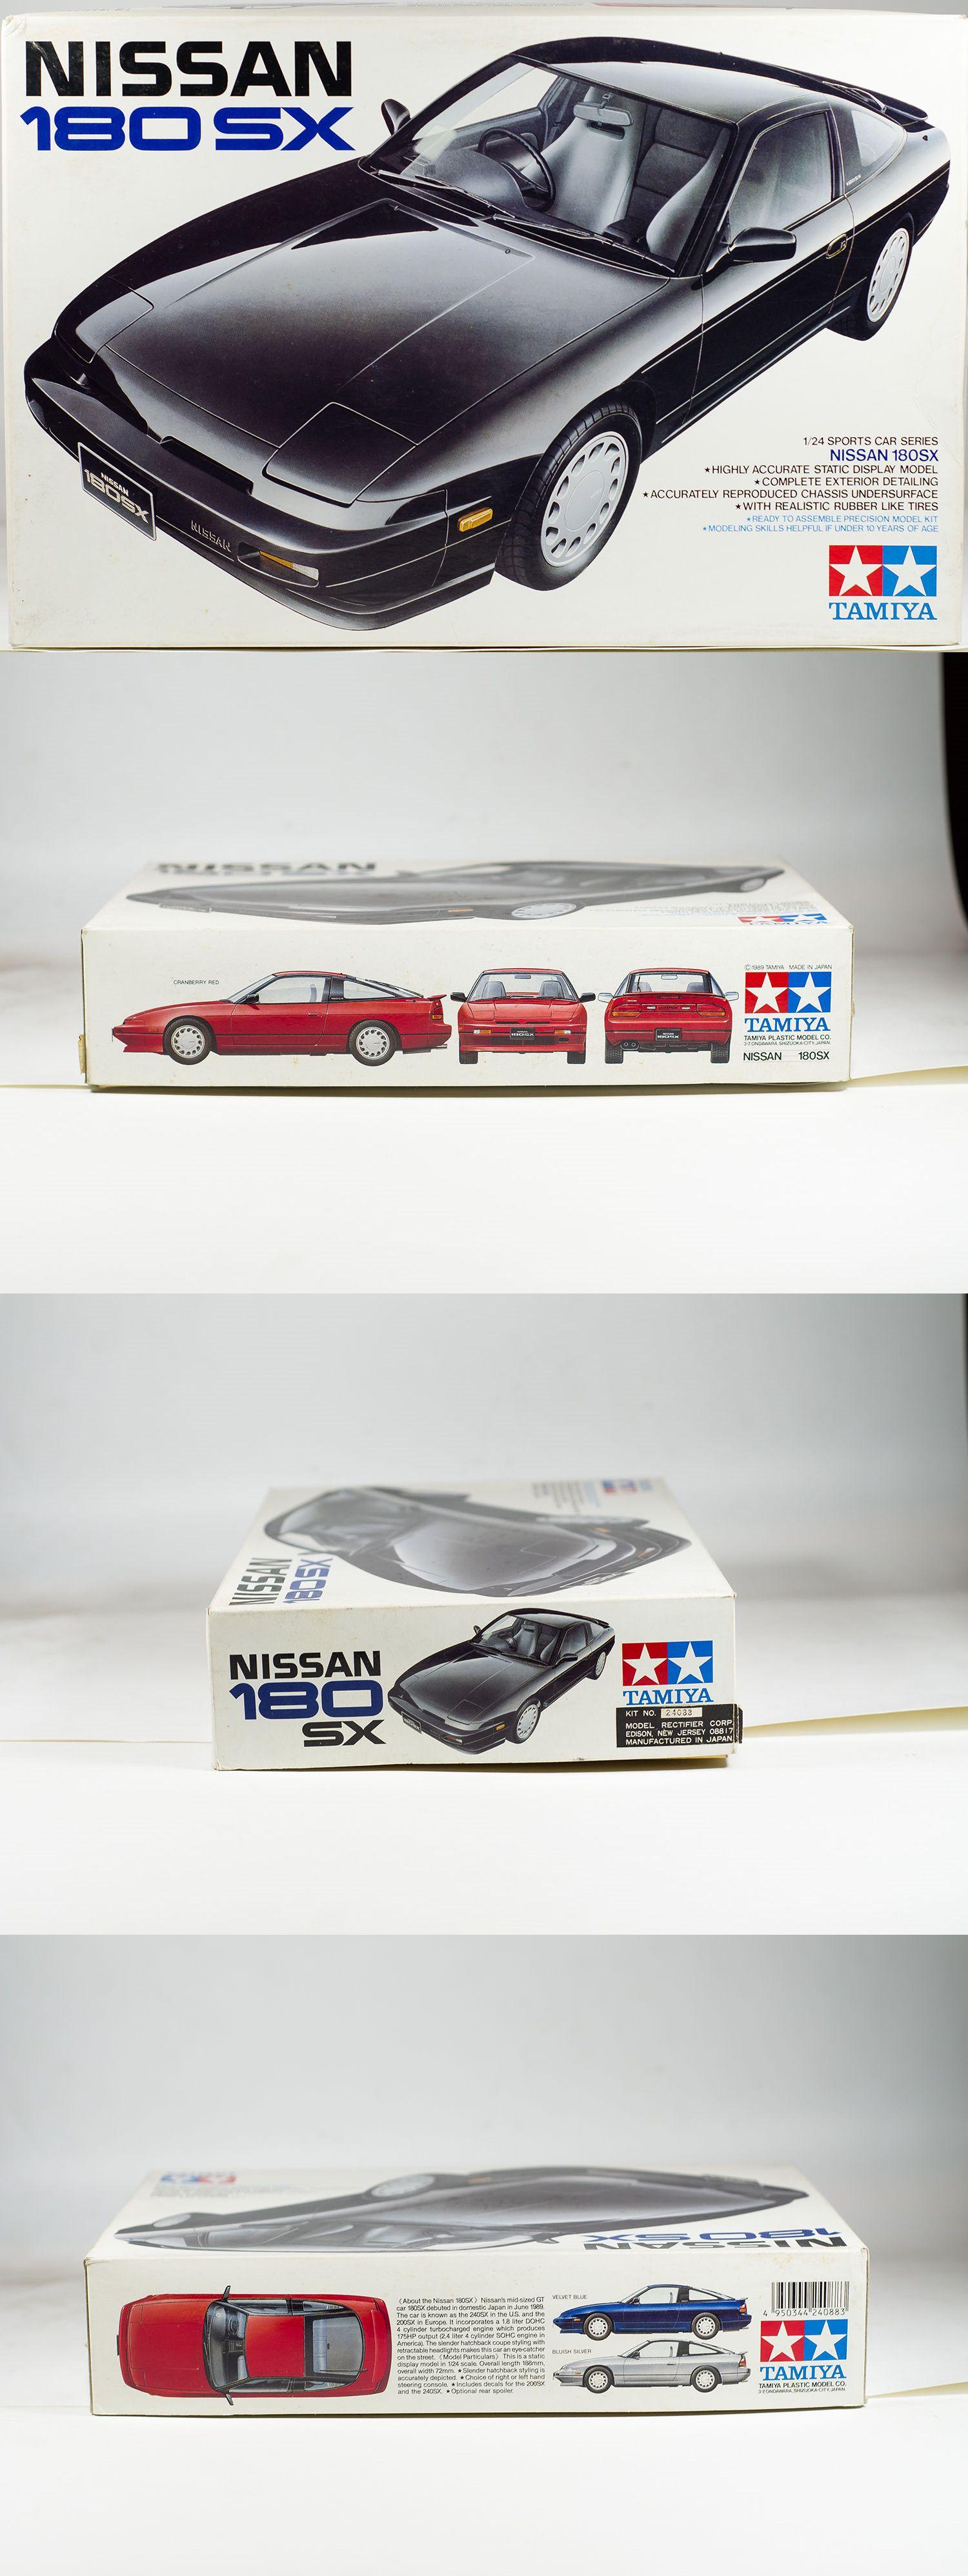 4bb5d6efb2b243f2d1d28014ec9e4ffc Breathtaking Tamiya Porsche 911 Gt1 Full View Cars Trend